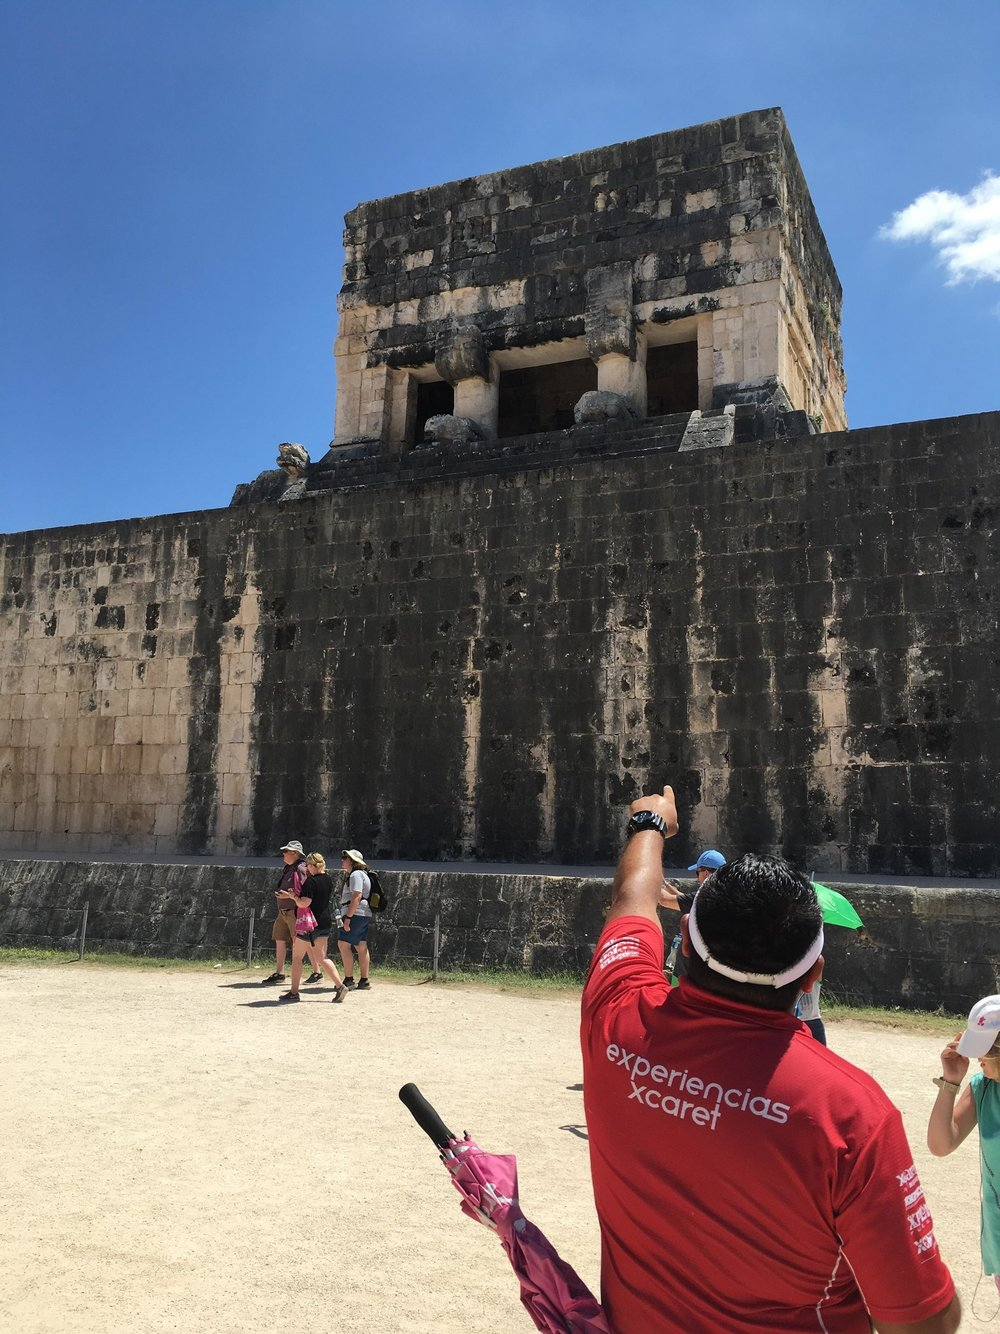 Raul explains the Mayan Ball Court